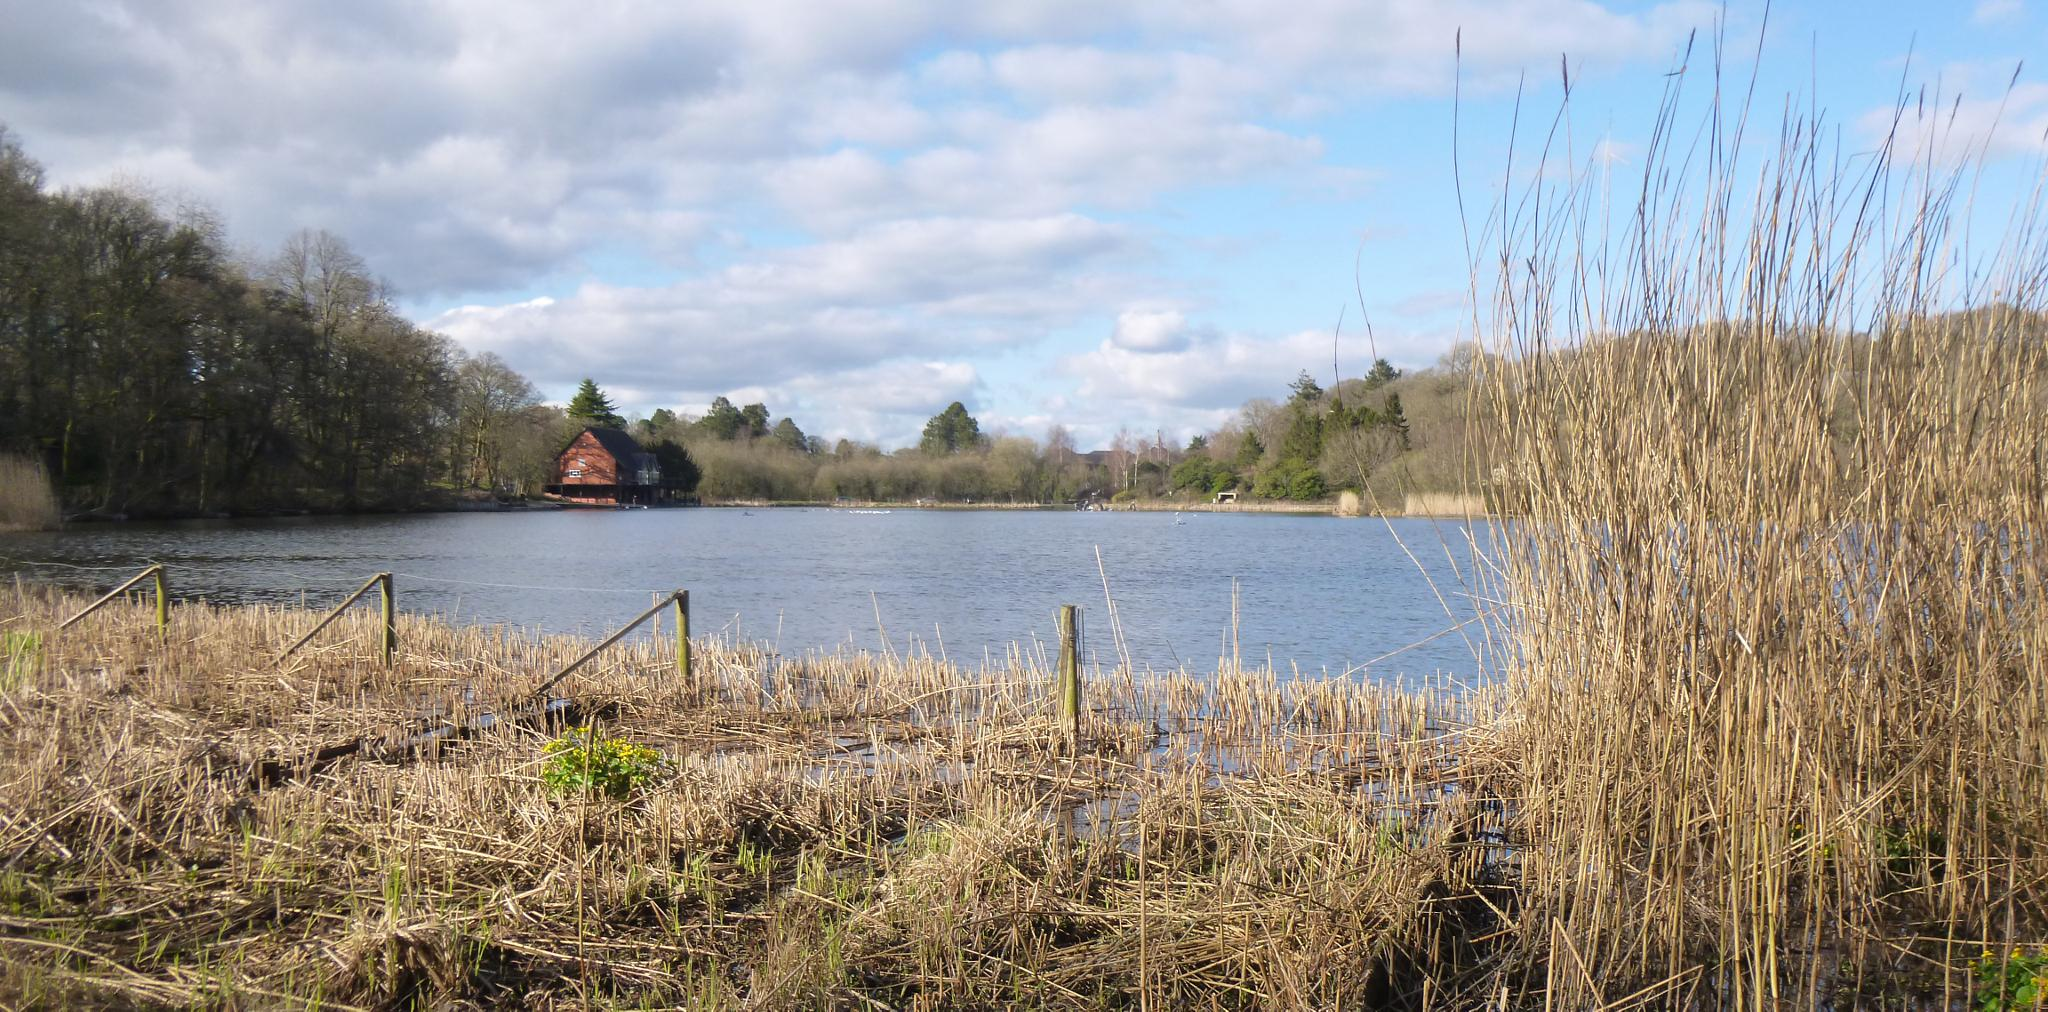 llandrindod wells lake by chris.adams.3557